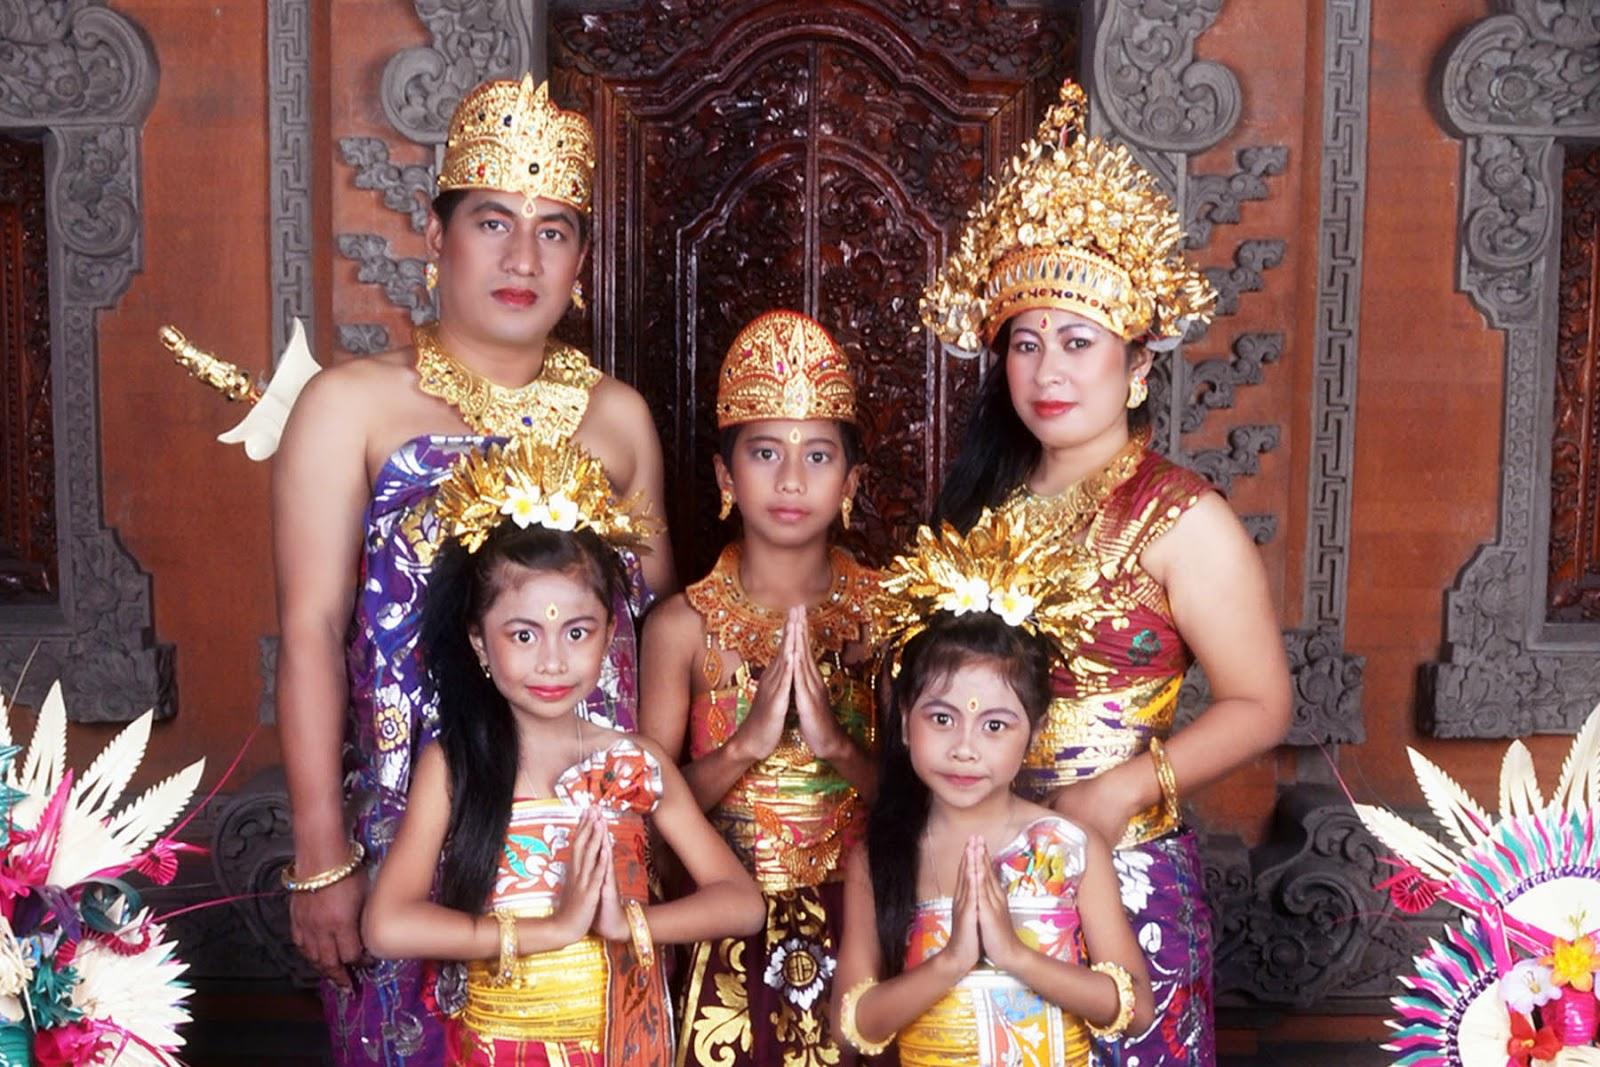 Pakaian budbahasa Bali merupakan salah satu pakaian budbahasa yang unik dan bervariasi Pakaian Adab Bali Dan Filosofinya